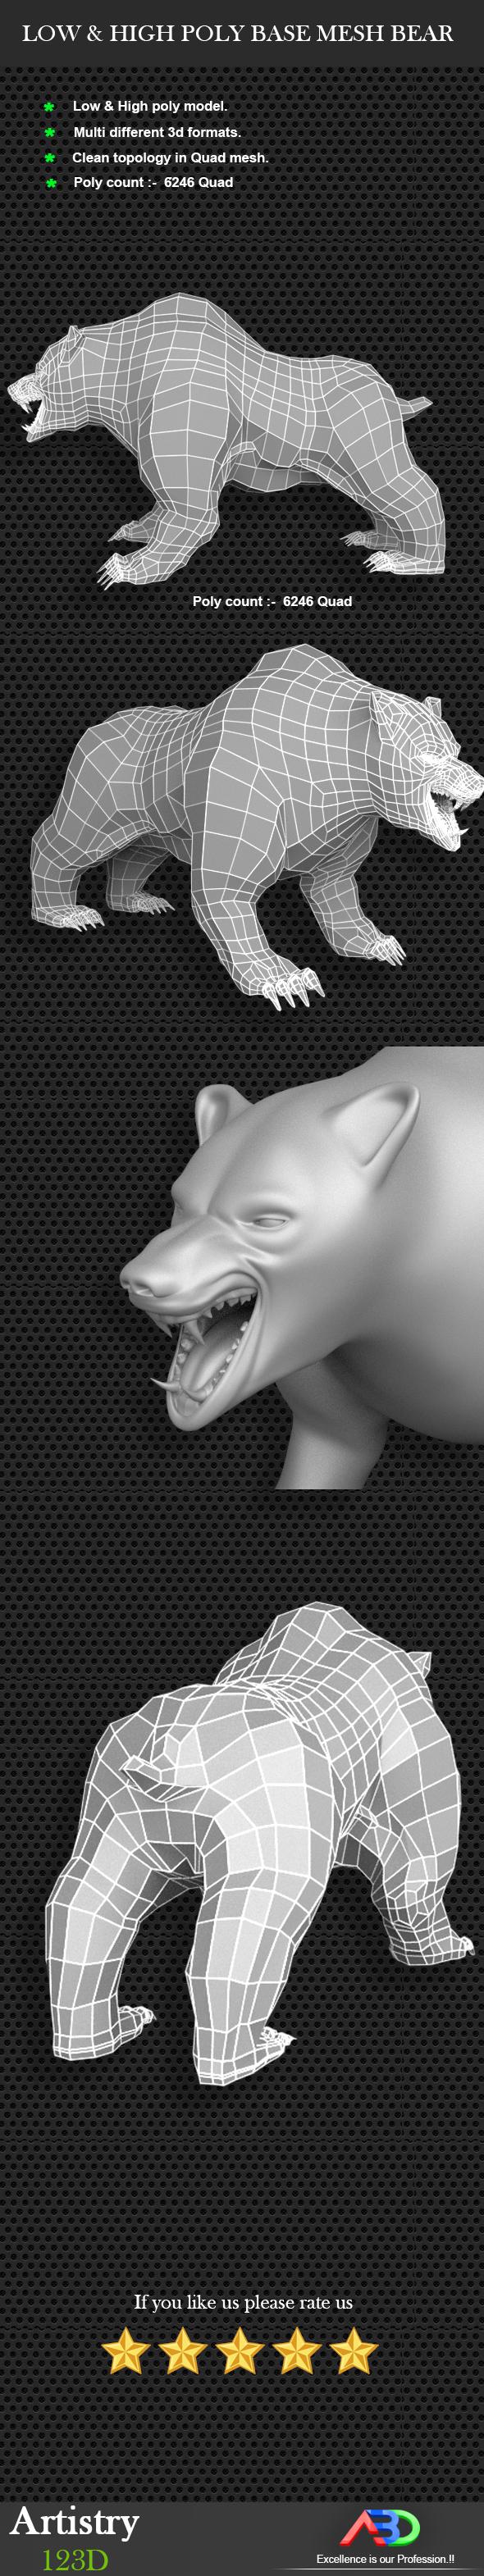 Bear Low & High Poly Base Mesh Bear - 3DOcean Item for Sale